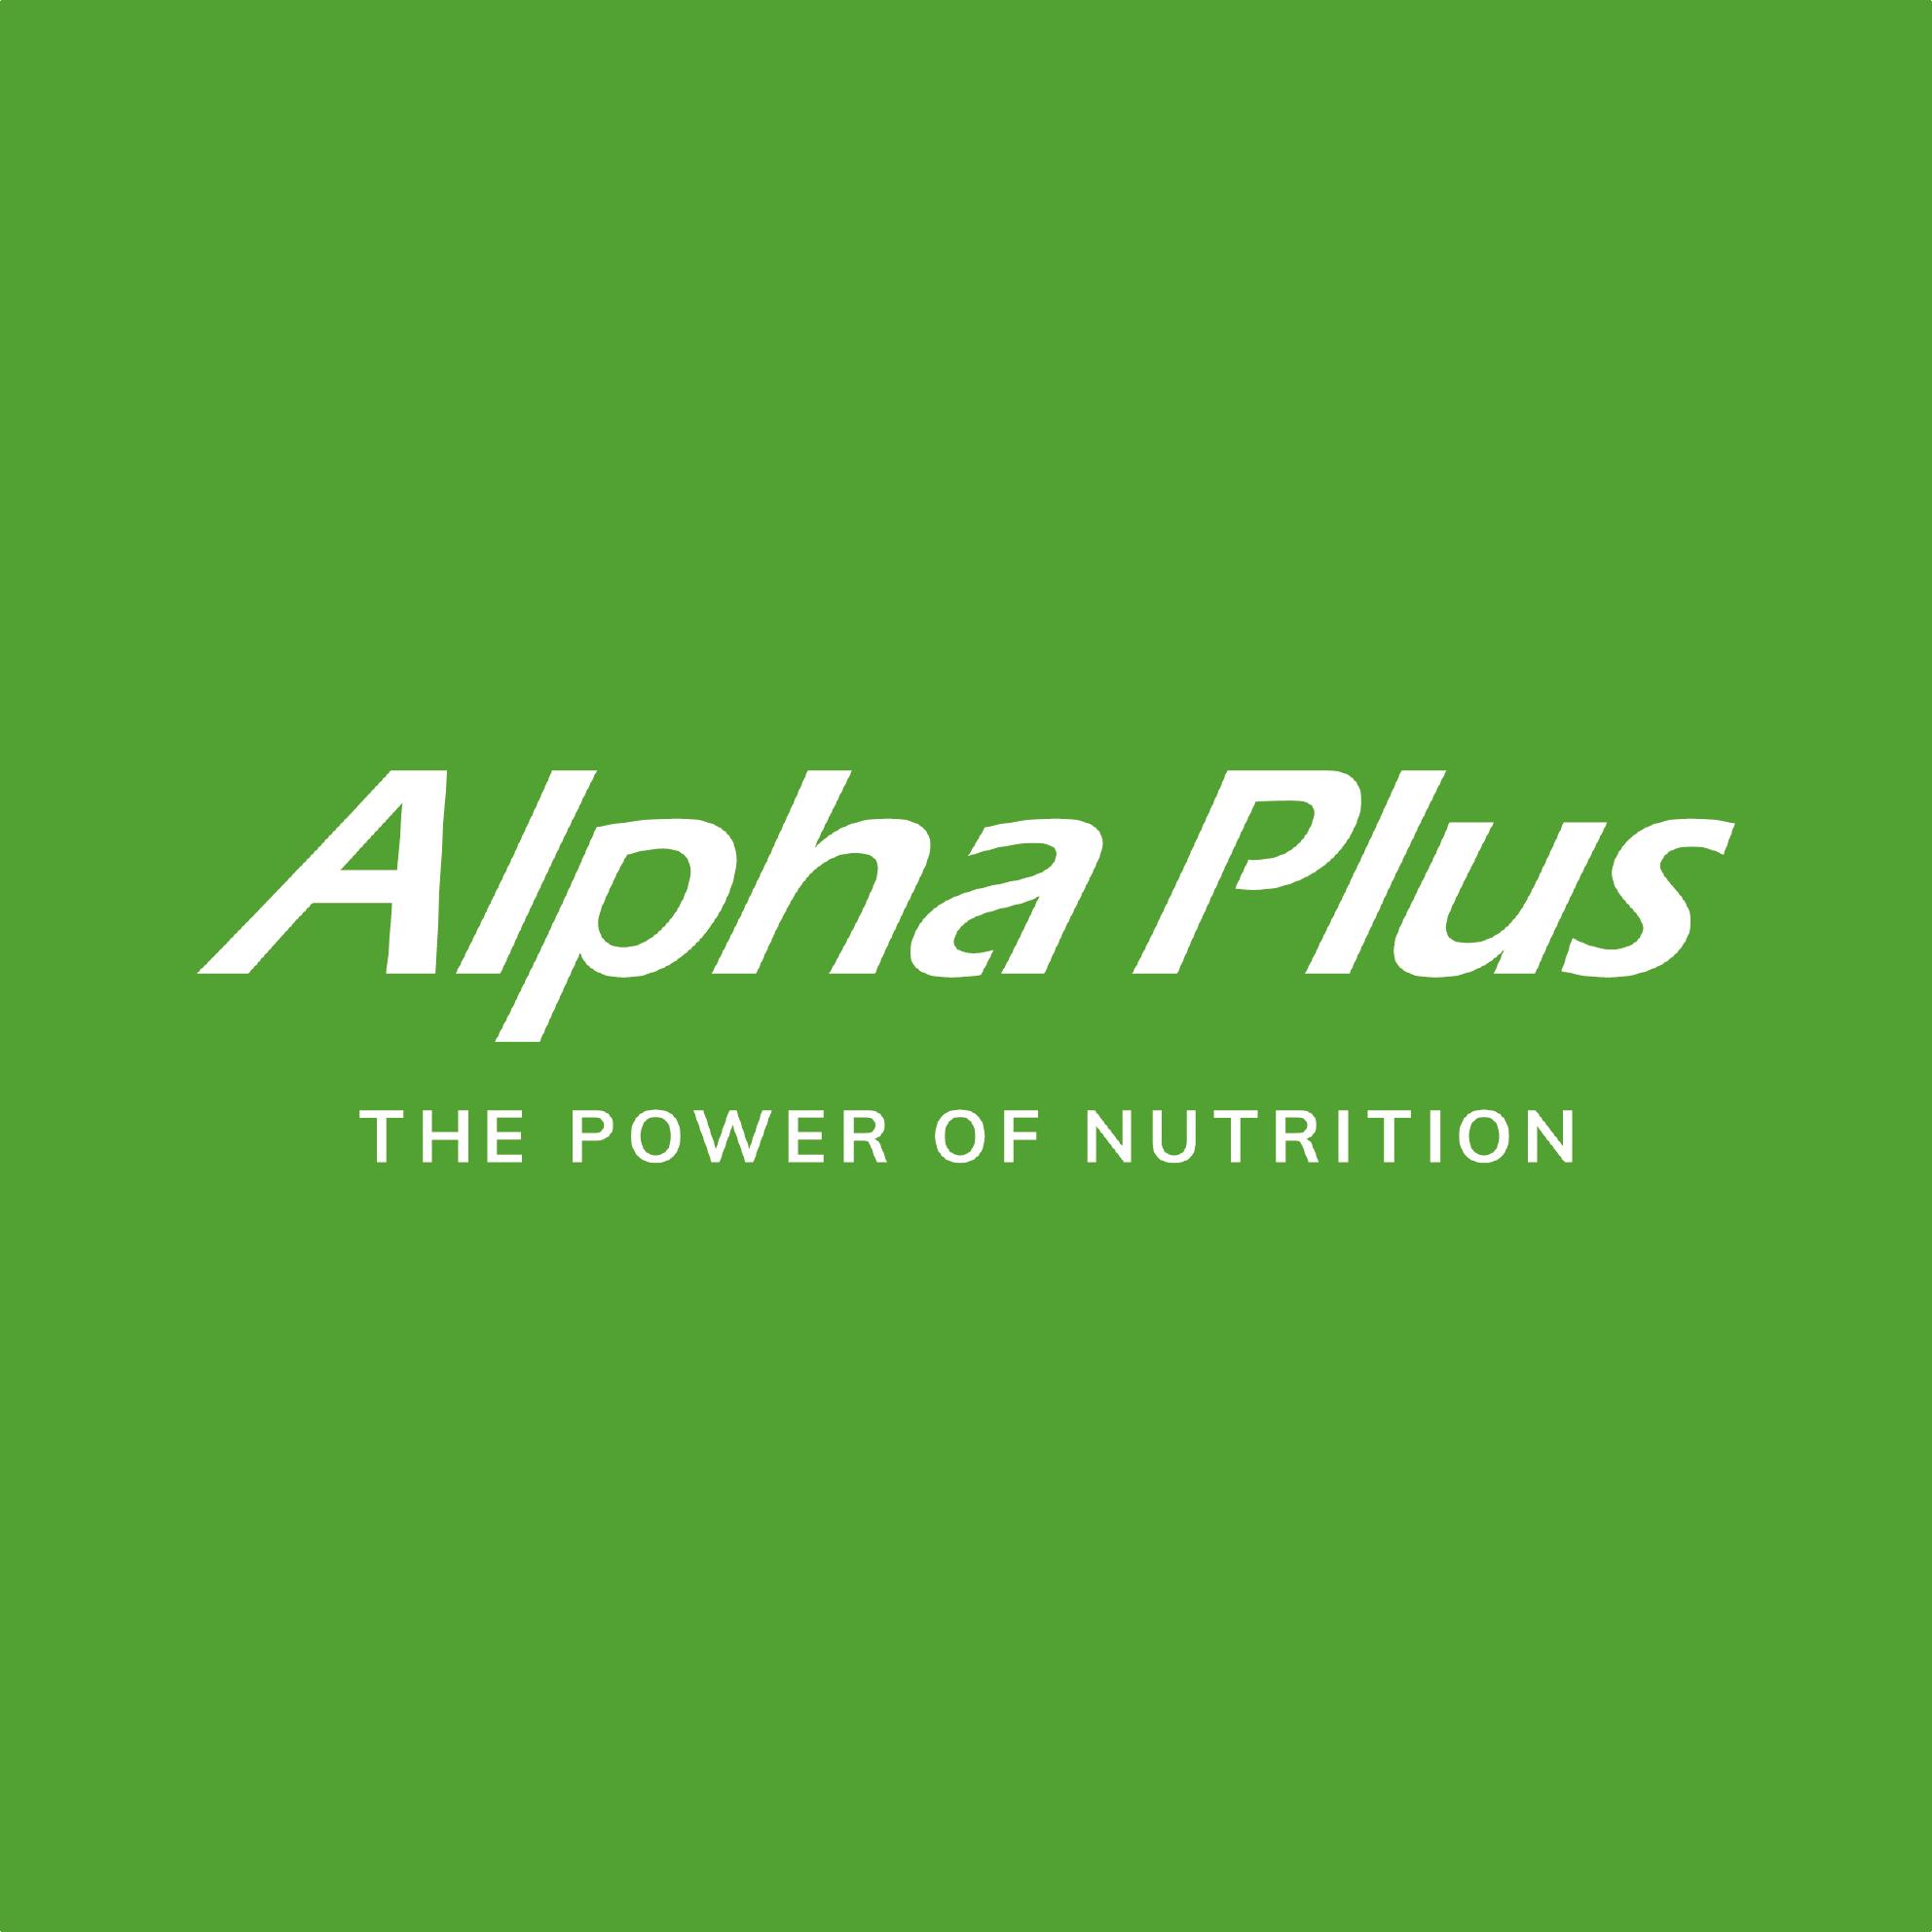 AlphaPlus logga